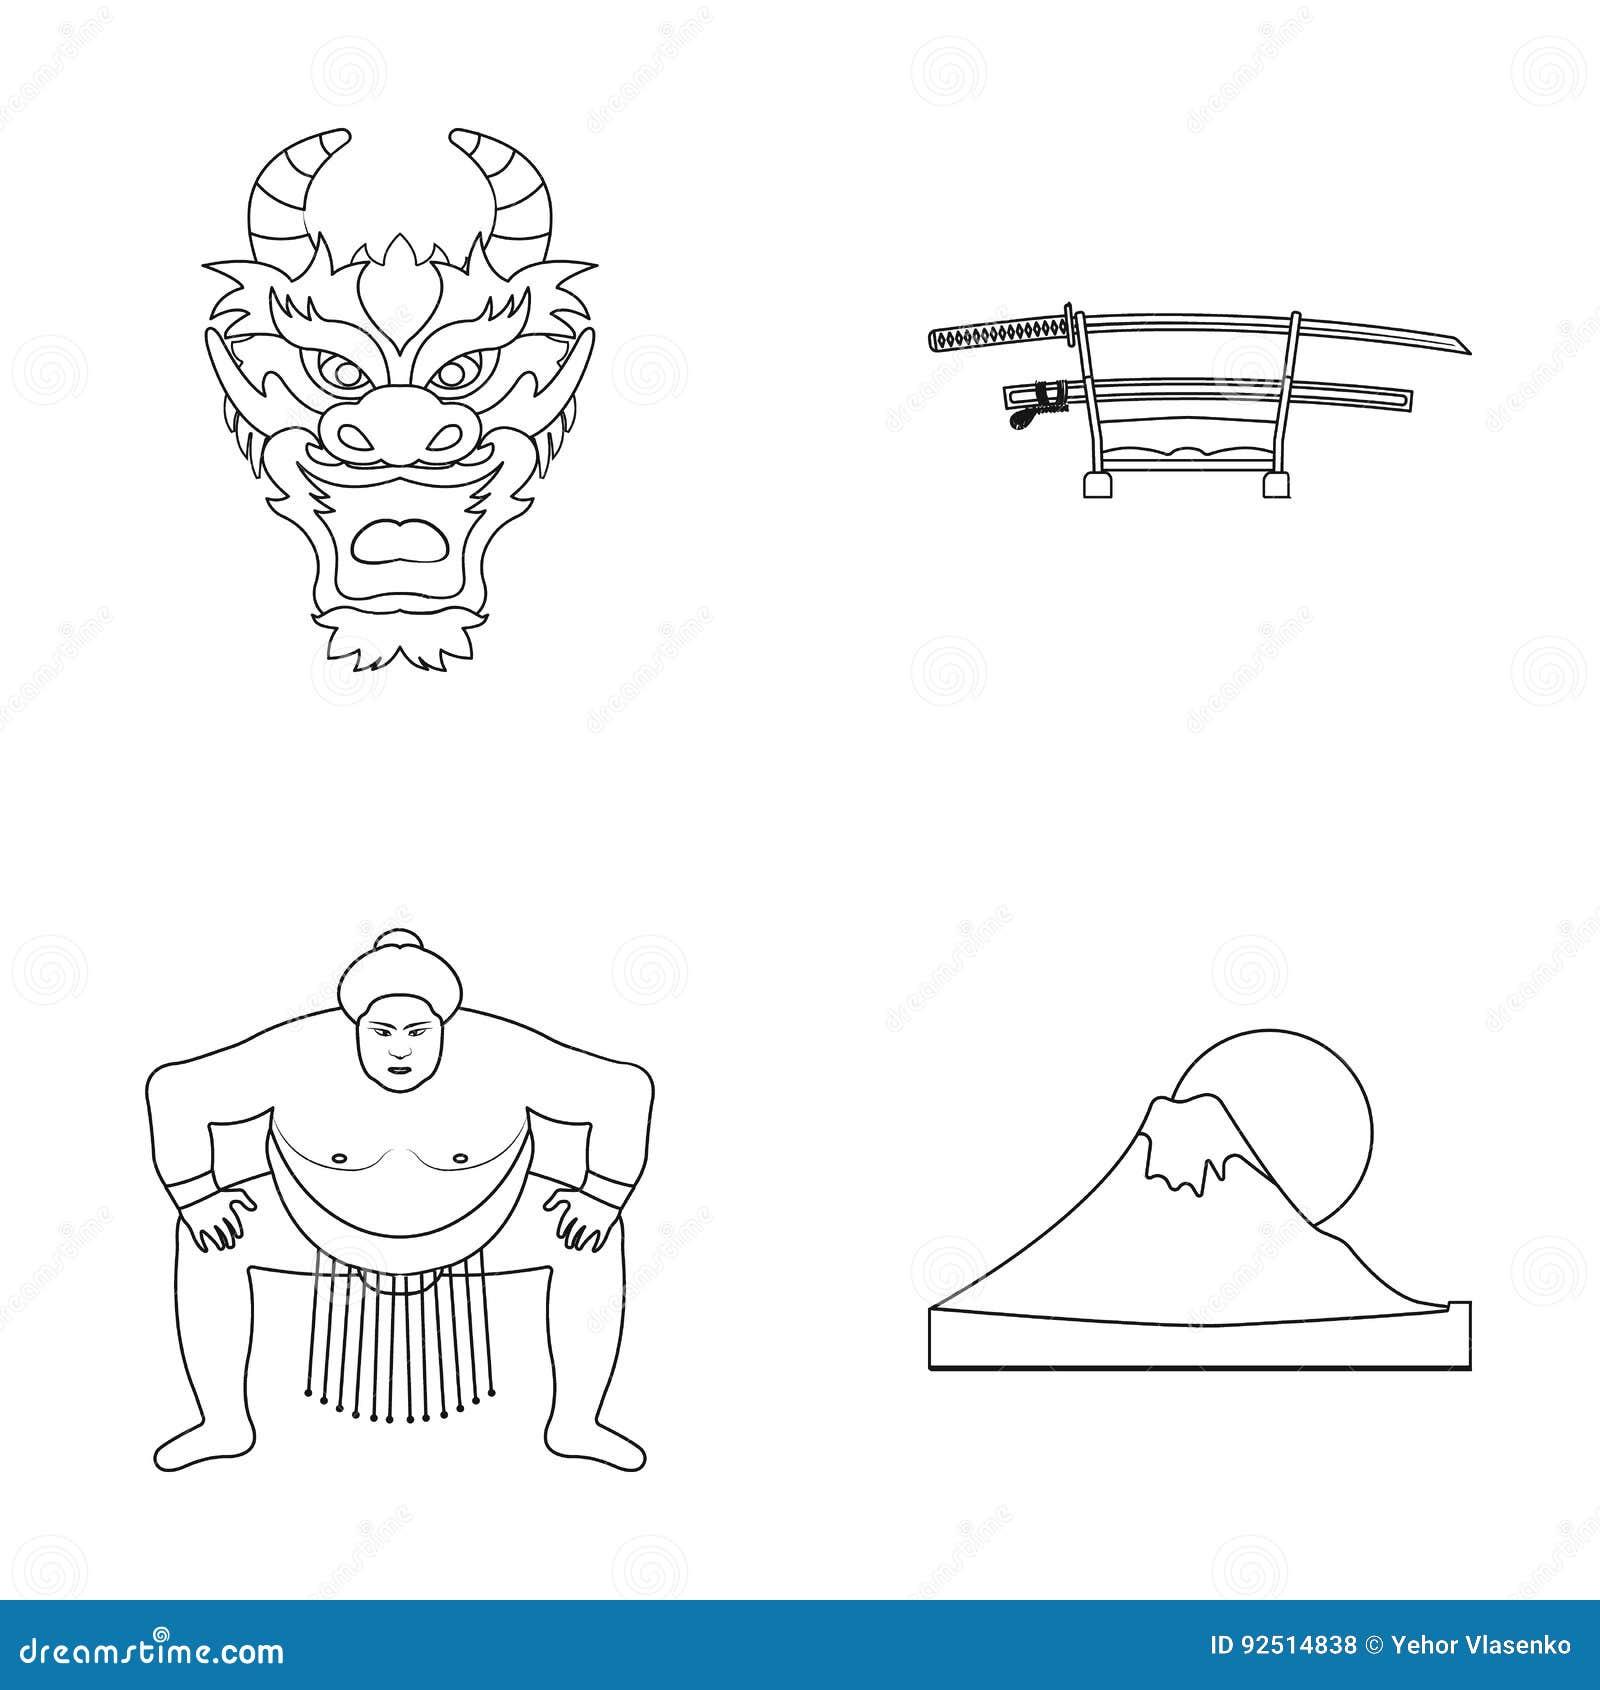 Bonito dos desenhos animados dragao | Baixar vetores gratis